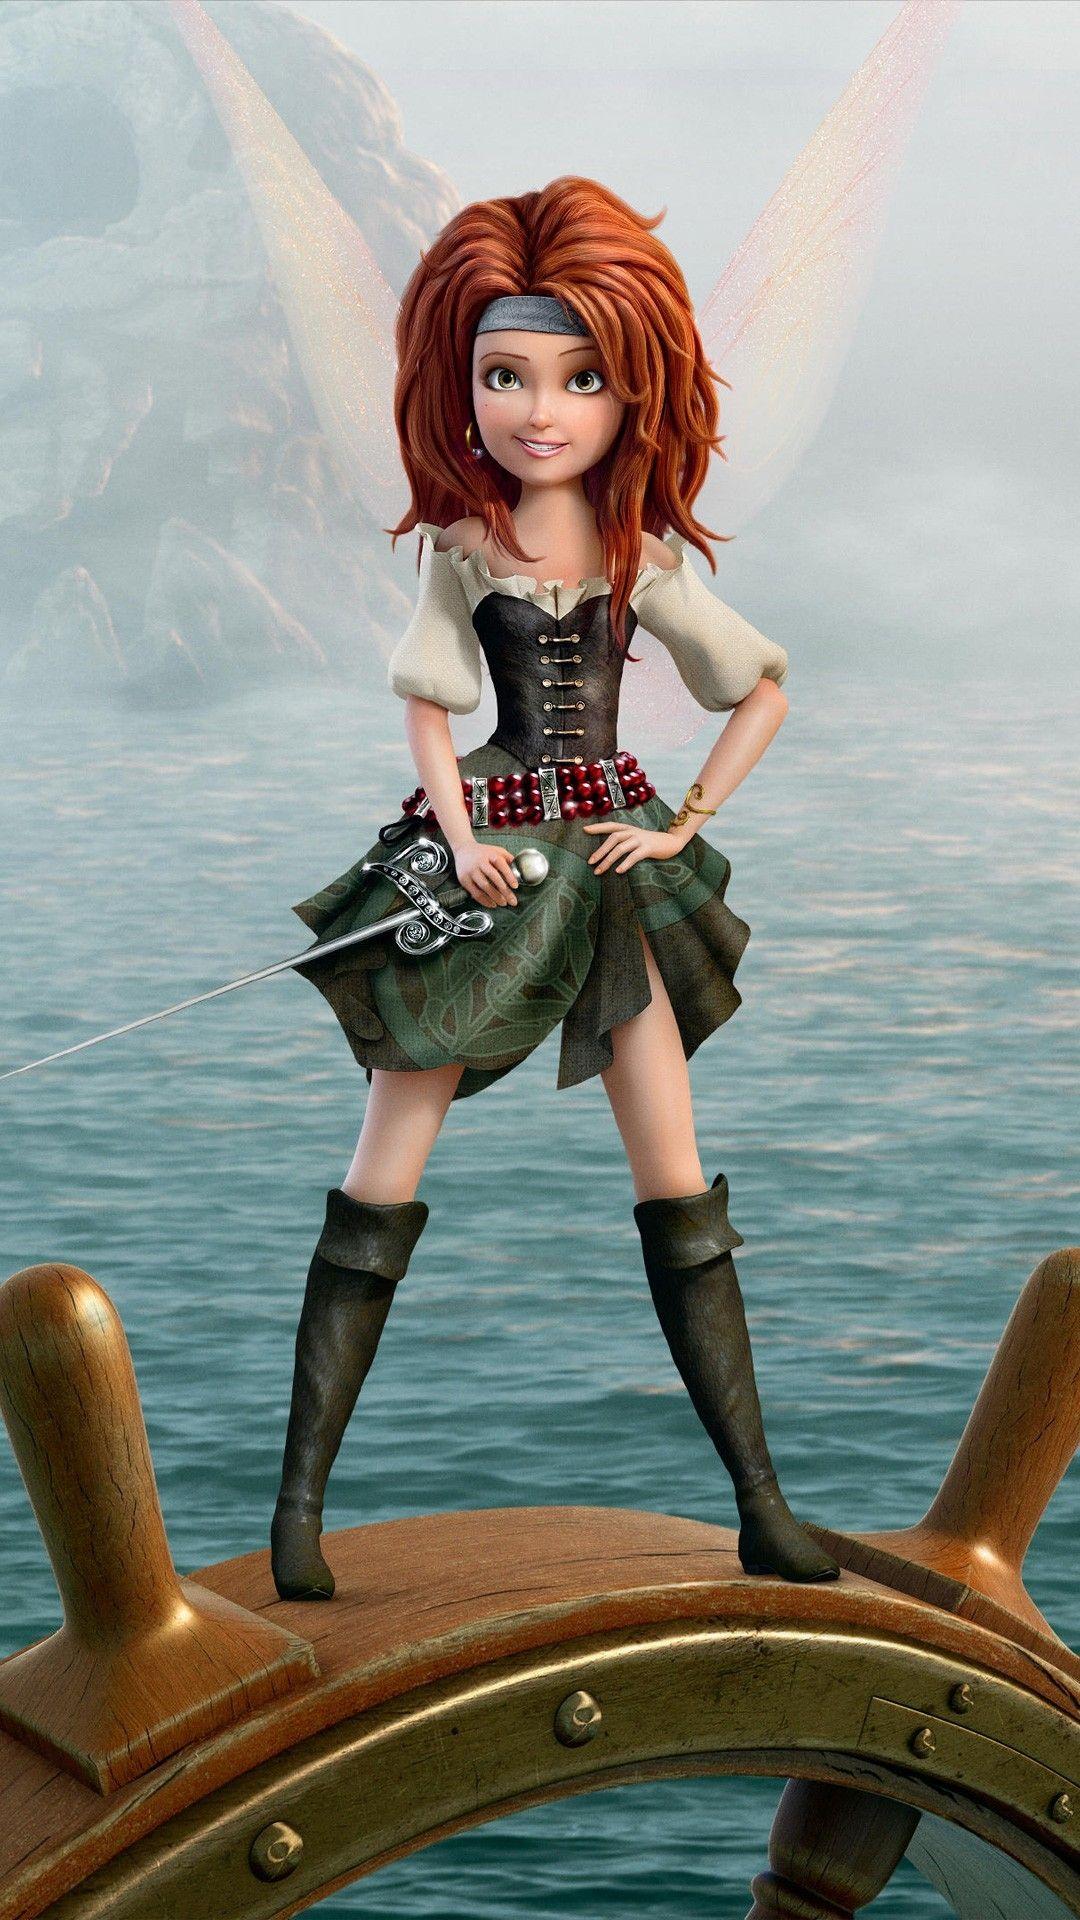 zarina the pirate fairy | Zarina the Pirate Fairy...she is so beautiful!  sc 1 st  Pinterest & Zarina | Pinterest | Pirate fairy Fairy and Tinkerbell